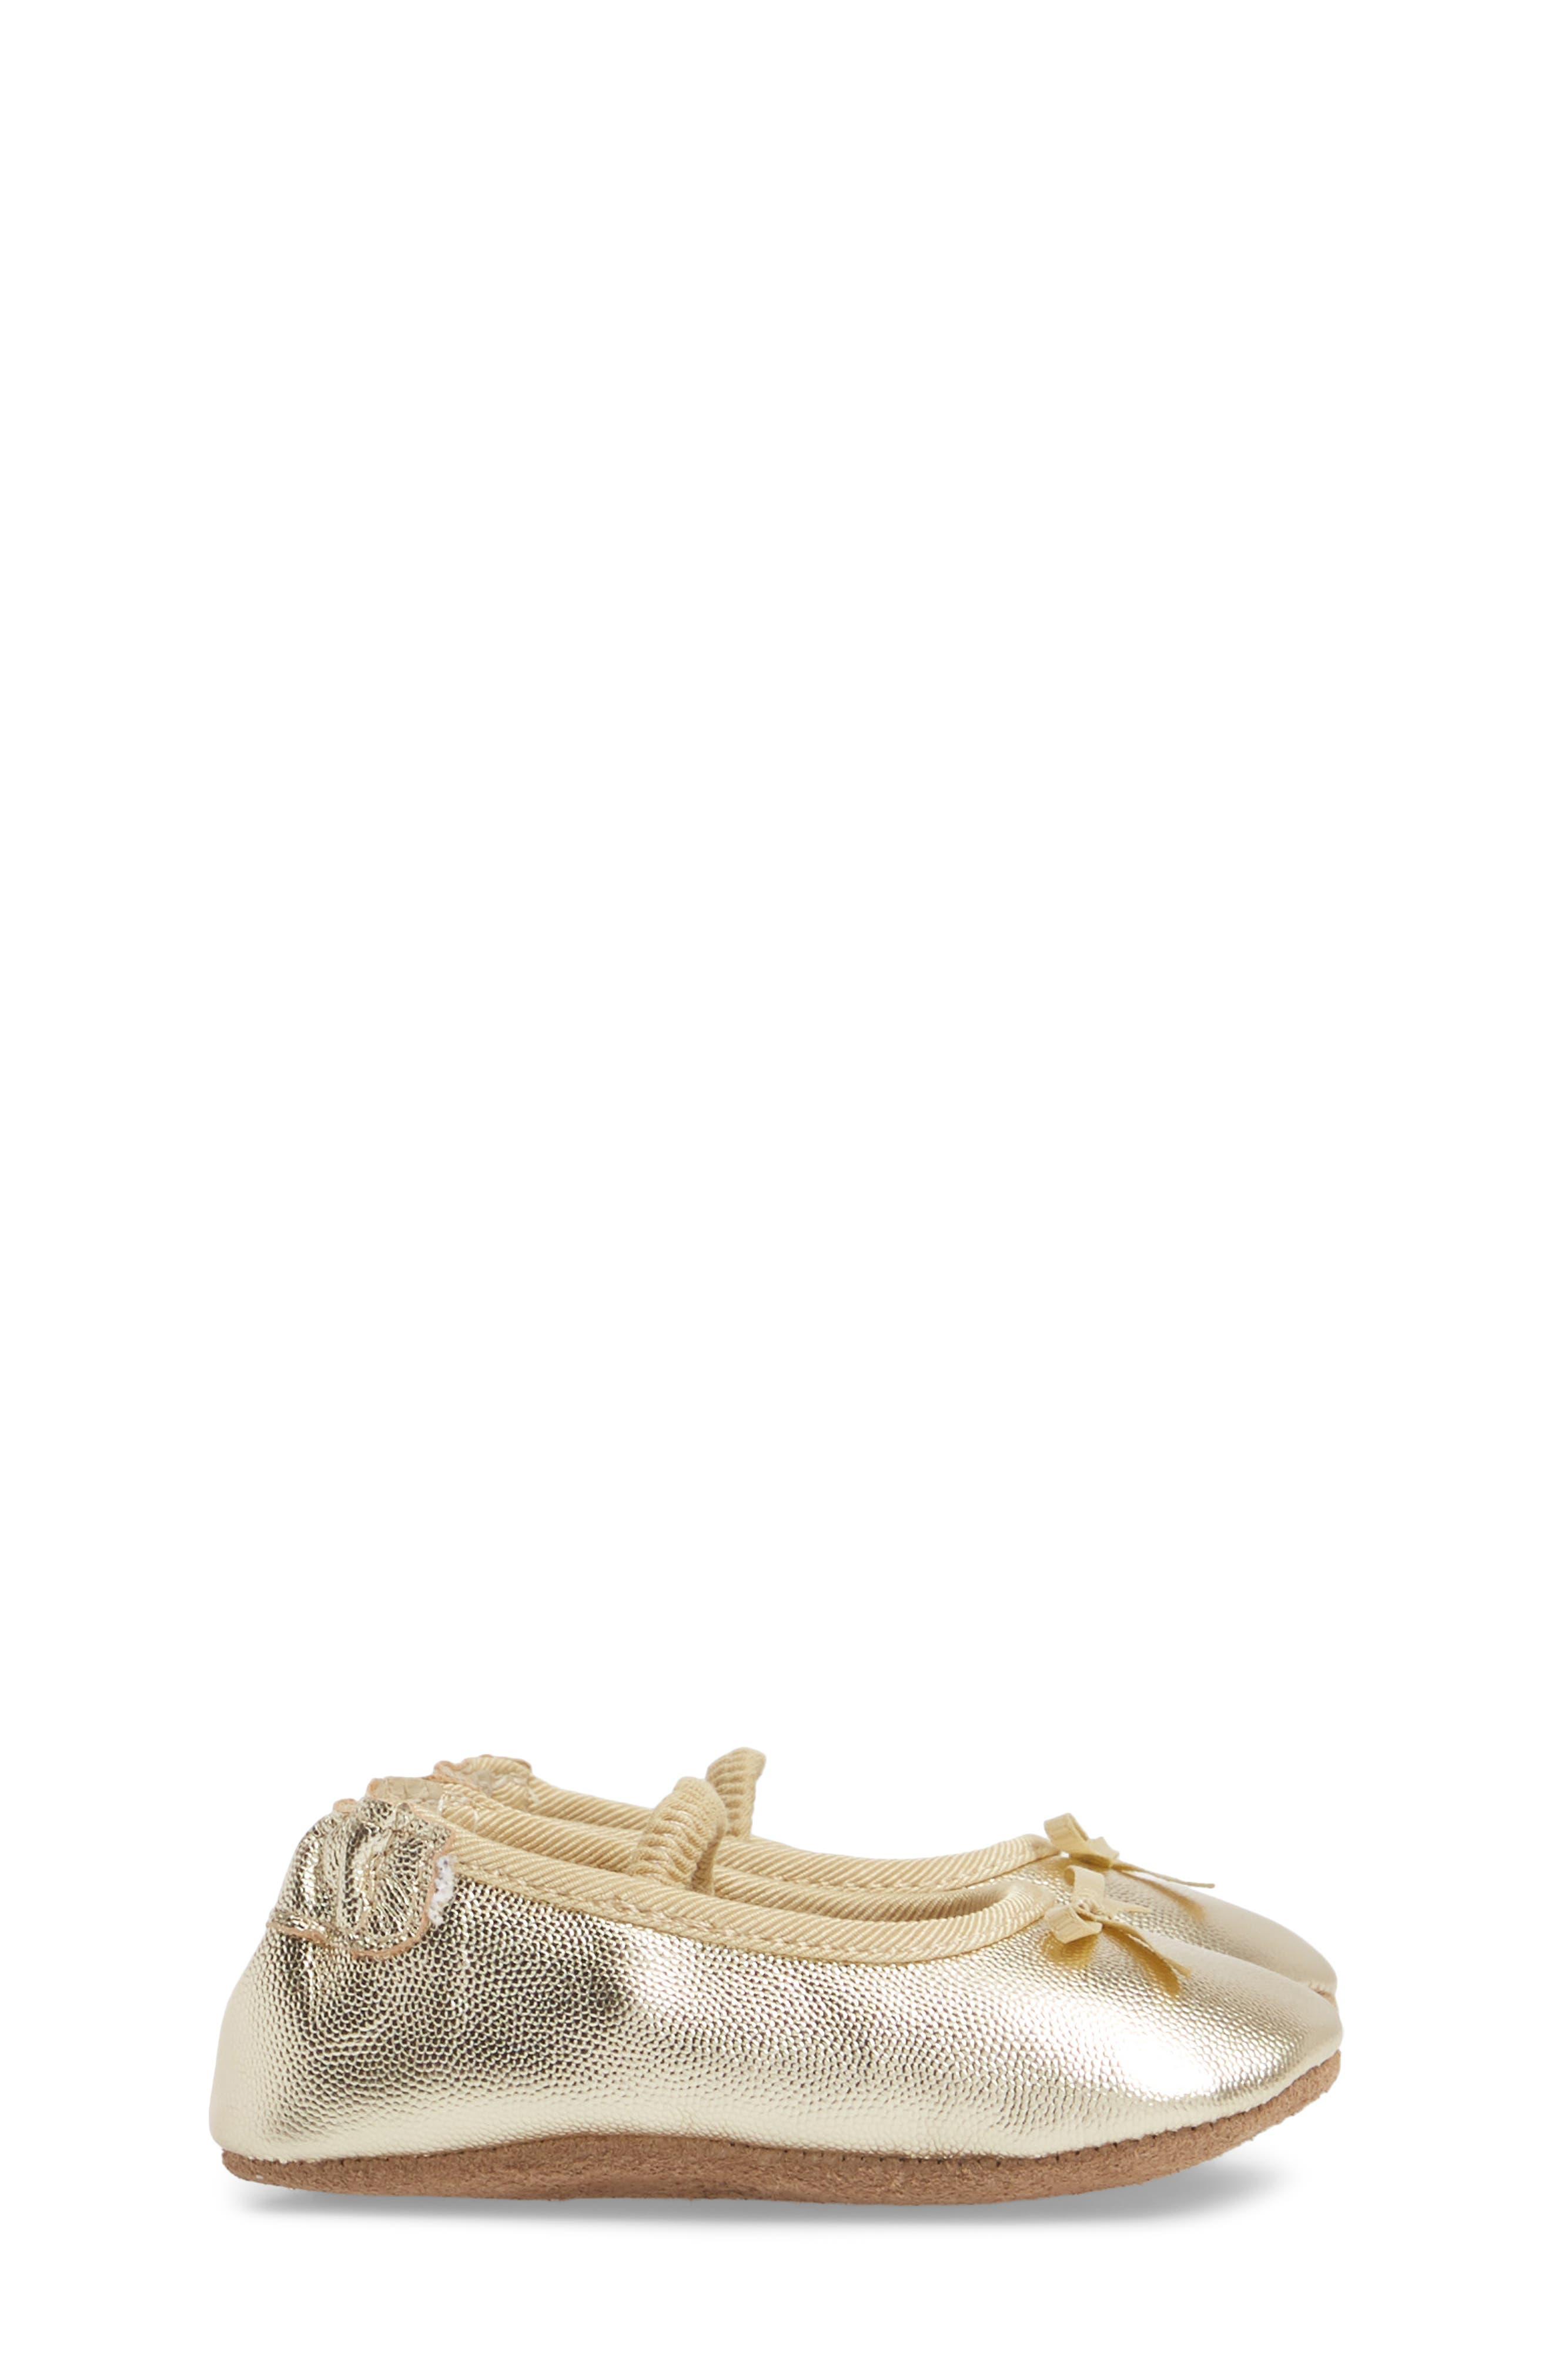 Athena Ballet Strap Crib Shoe,                             Alternate thumbnail 3, color,                             GOLD